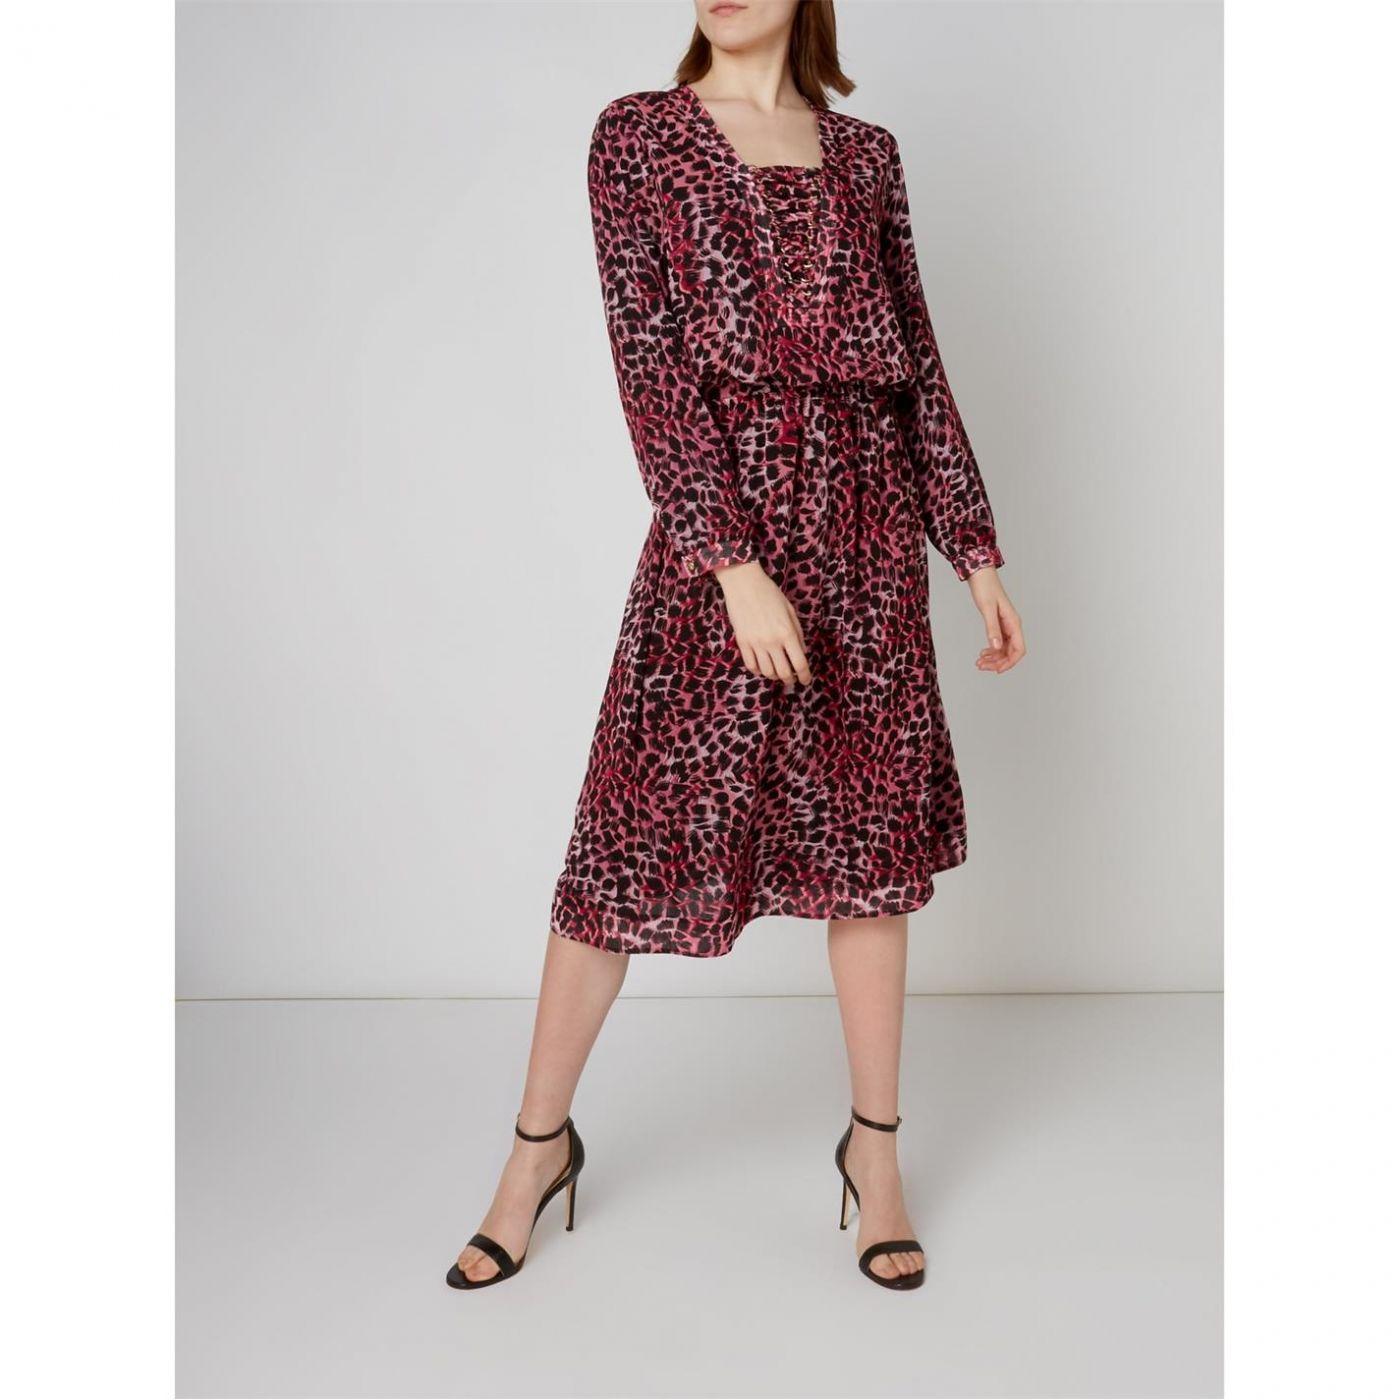 Biba Animal Print Dress